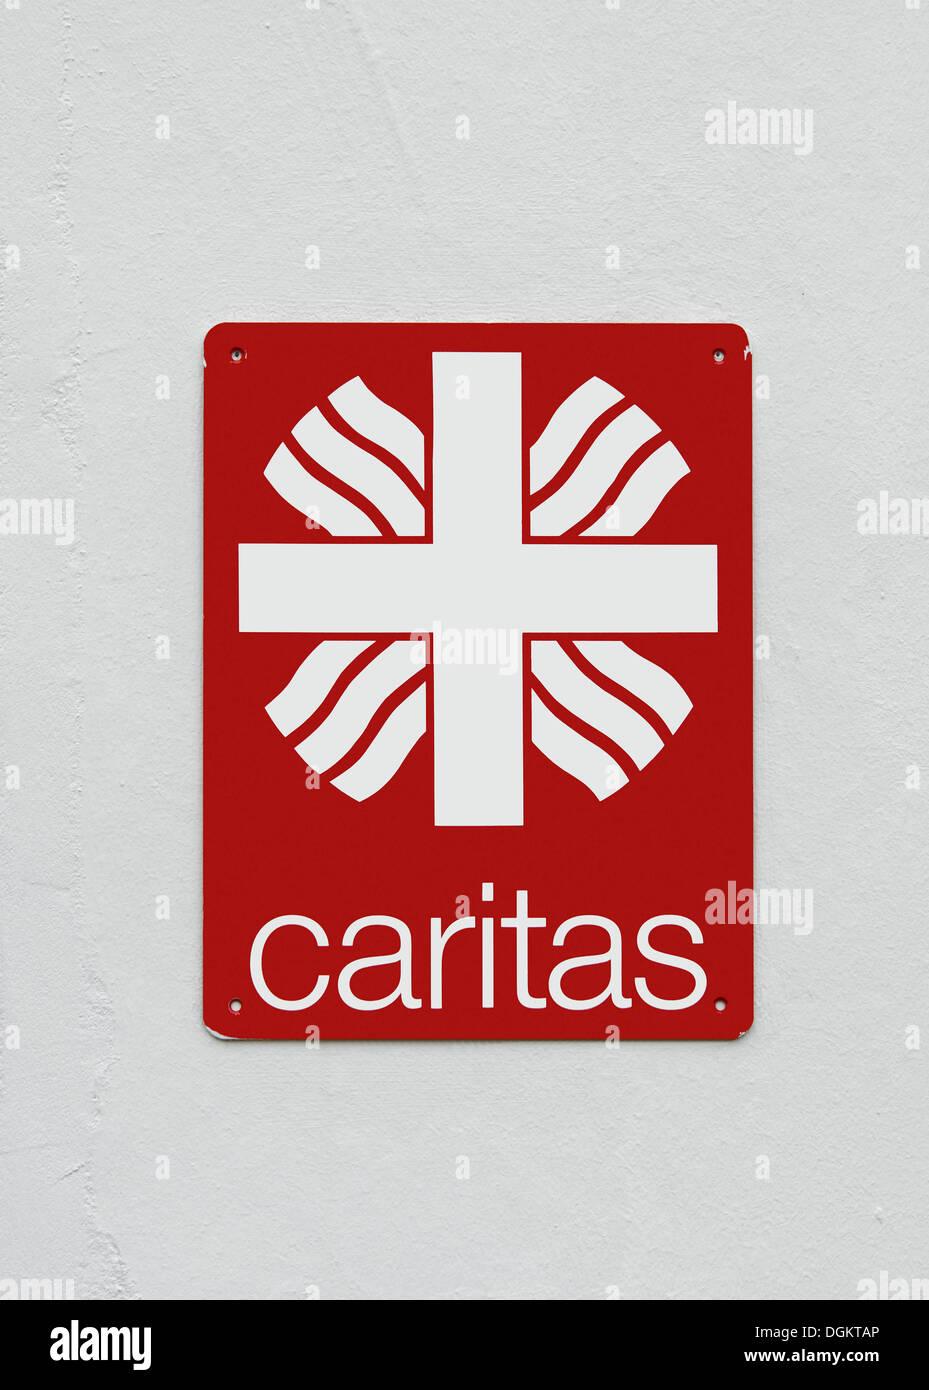 Sign, logo of Caritas, on a white wall, Deutscher Caritasverband e.V., Roman Catholic Caritas charity, PublicGround - Stock Image